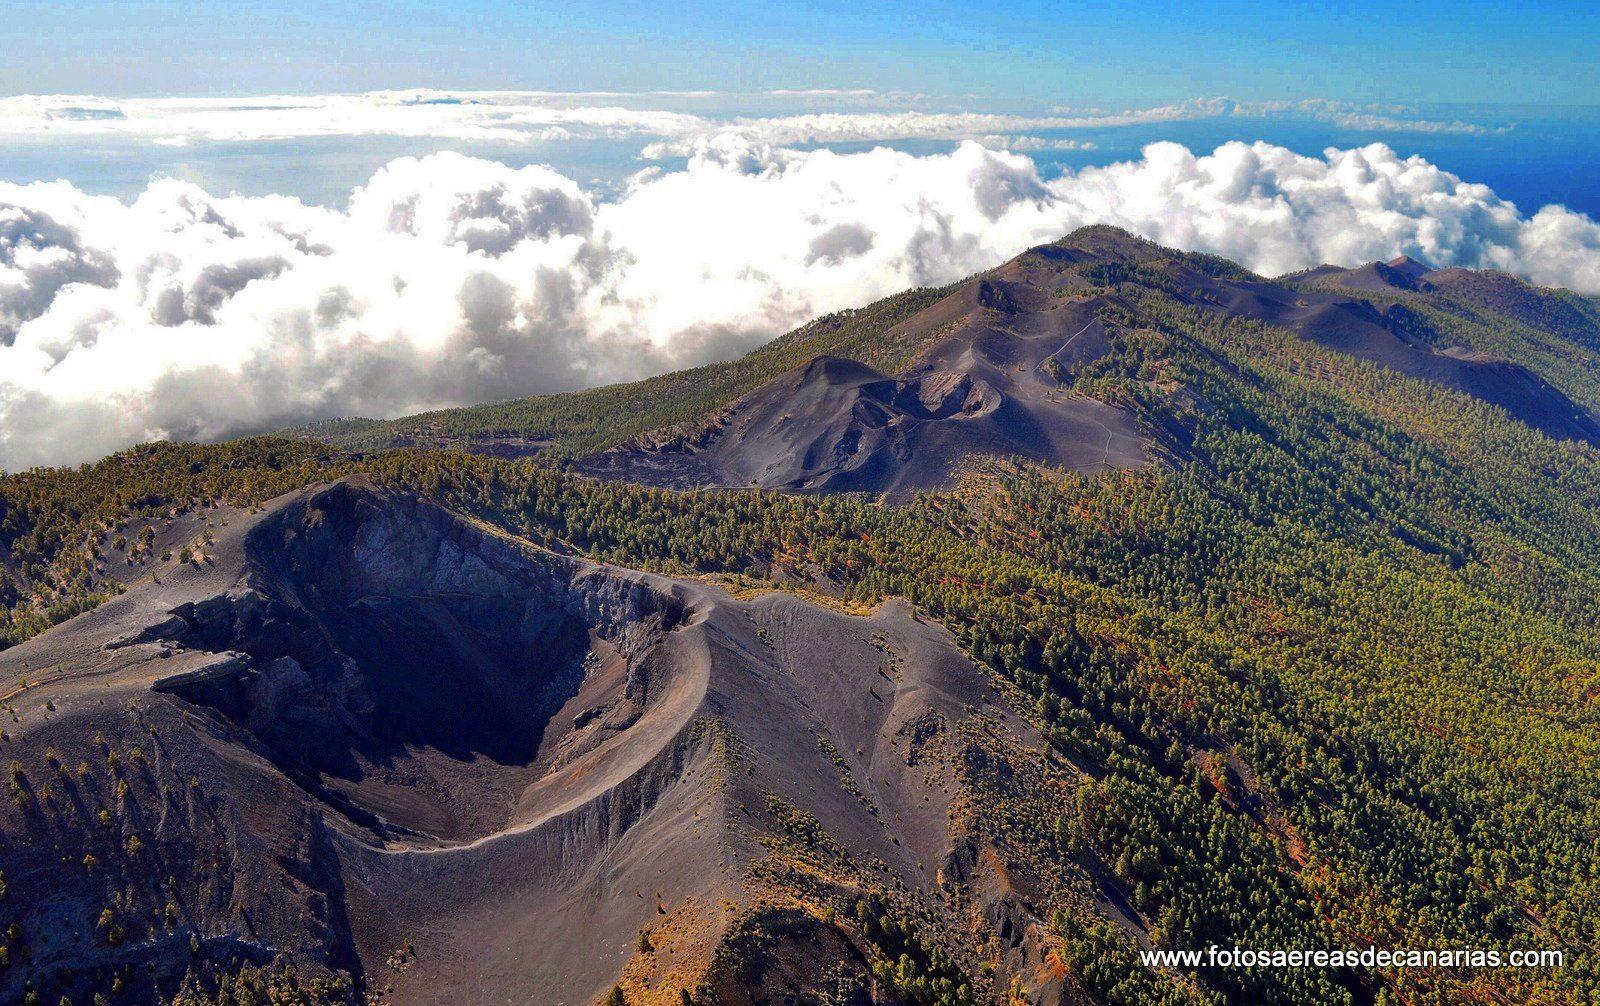 La Palma - The volcanic chain of the Cumbre Vieja - Fotoaereasdecanarias